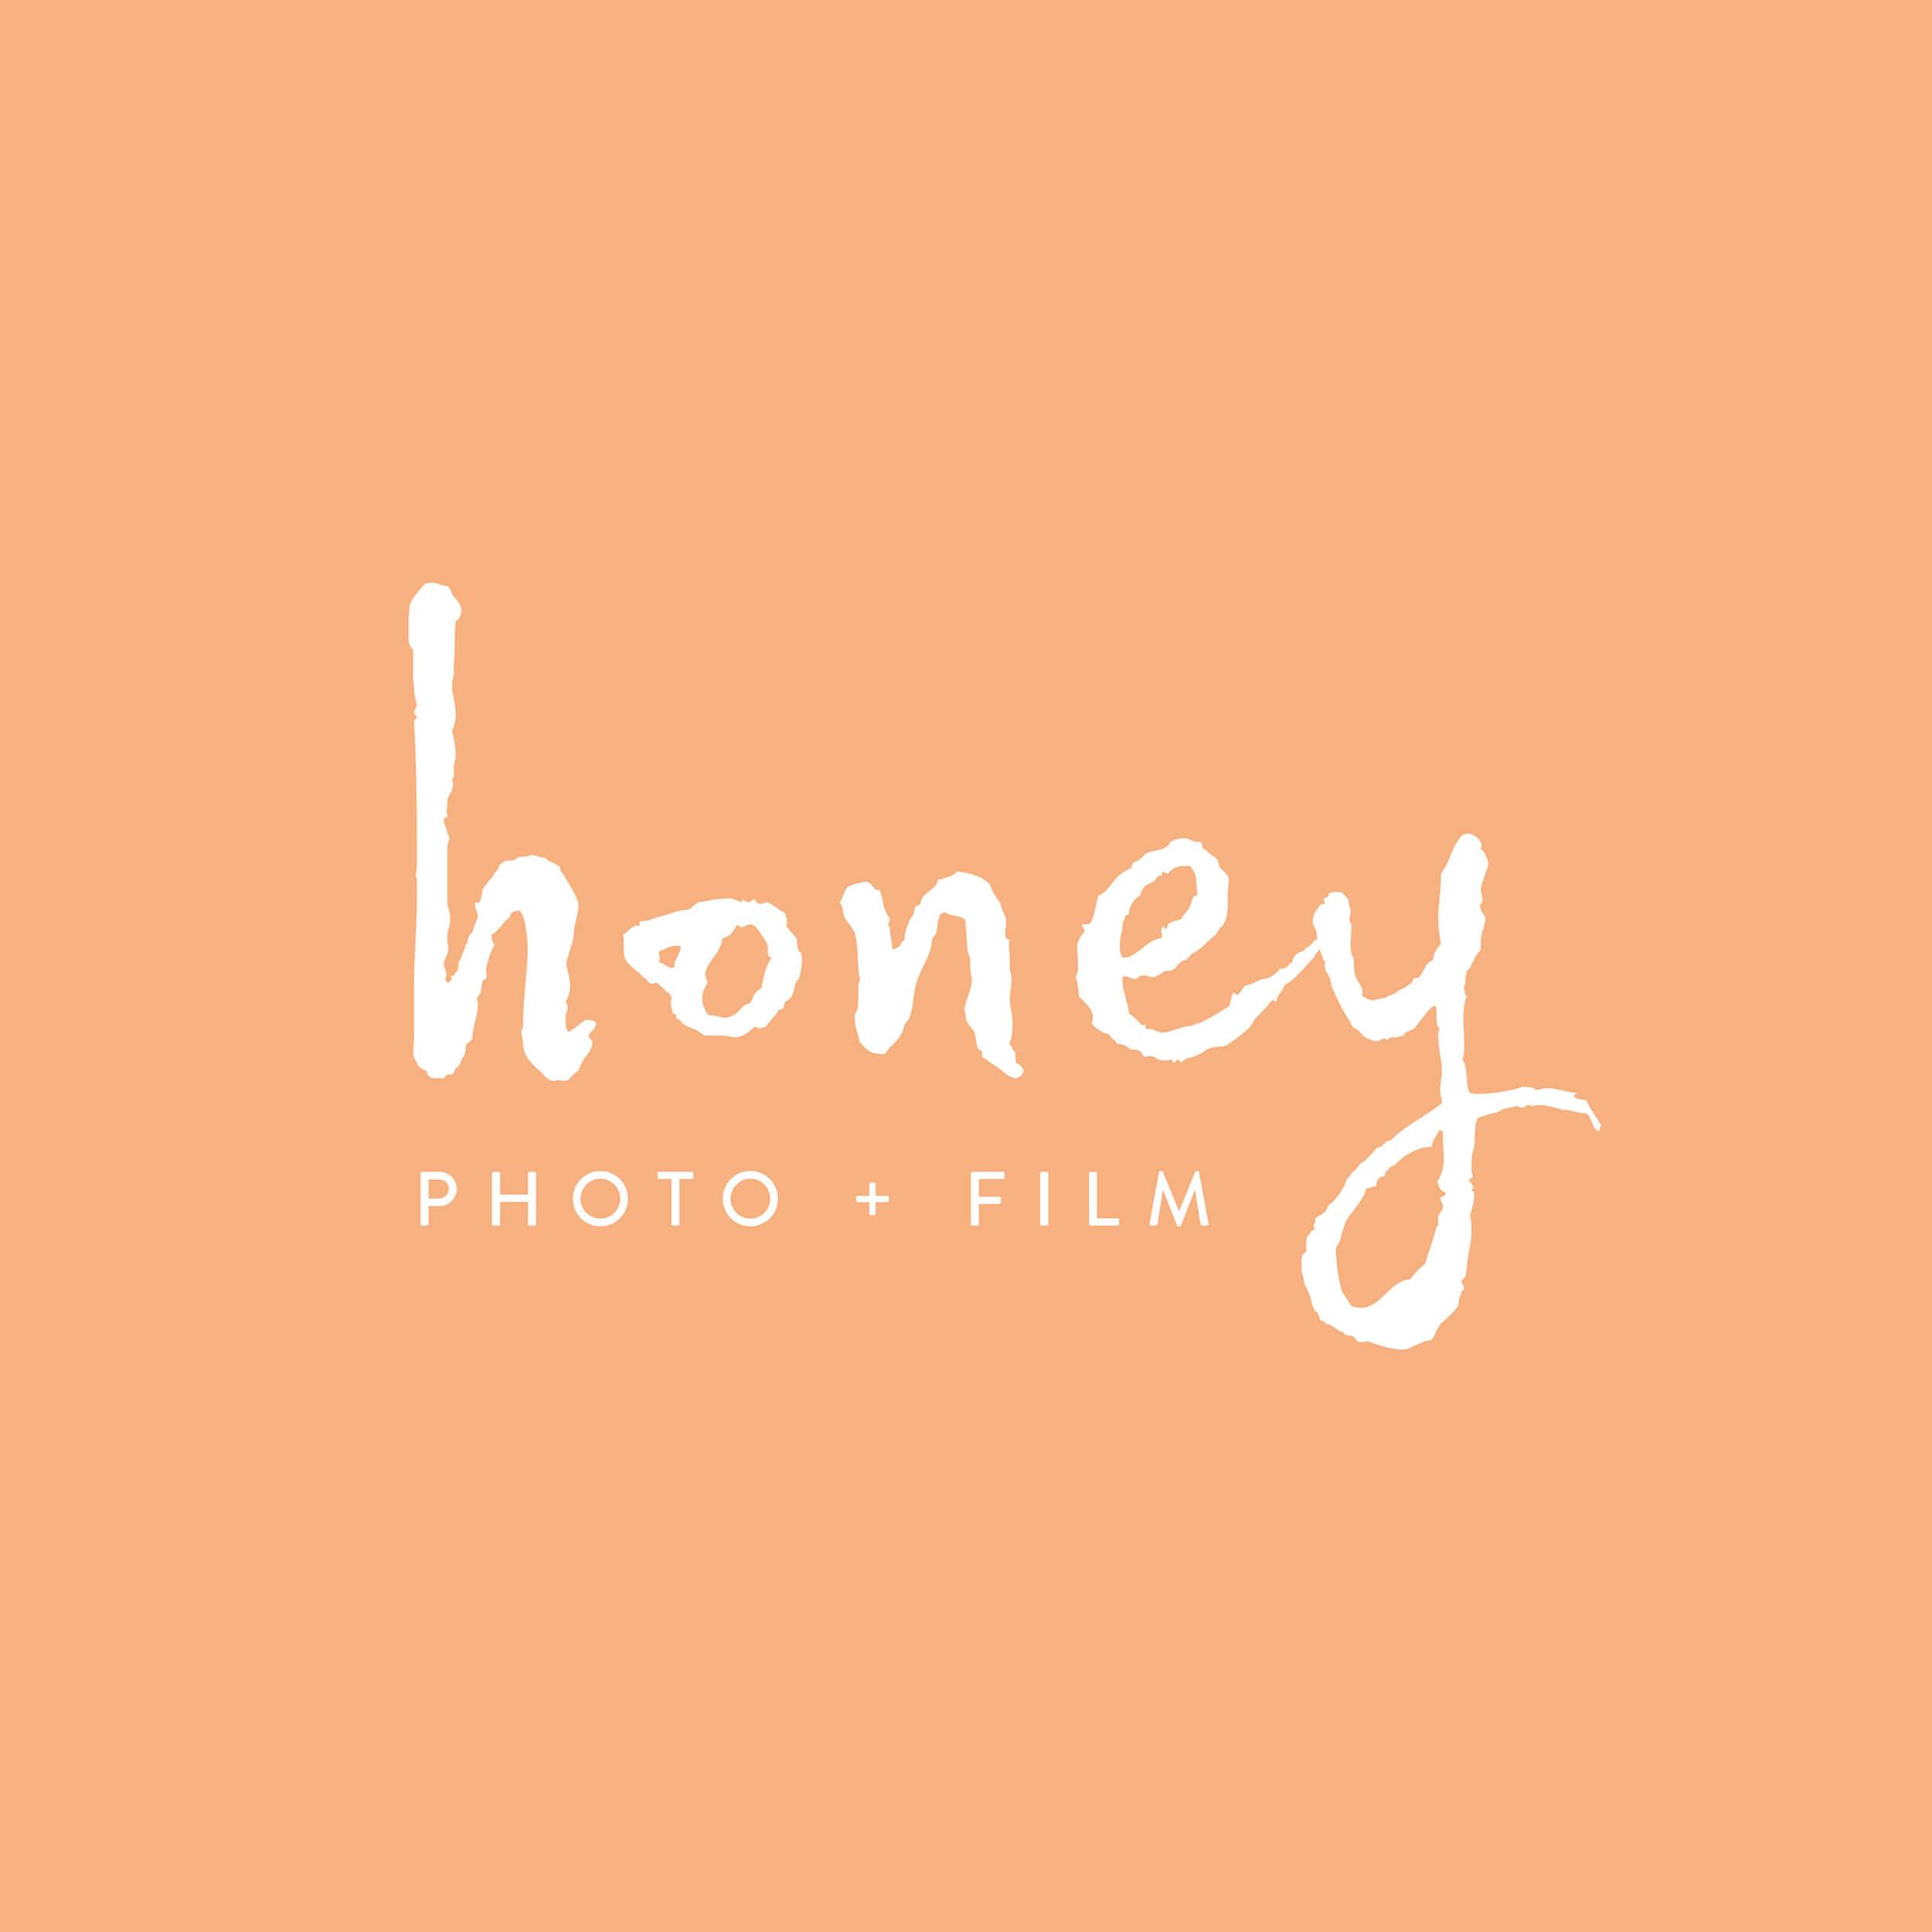 Honey Atkinson Photo + Film, Branding and Web Design